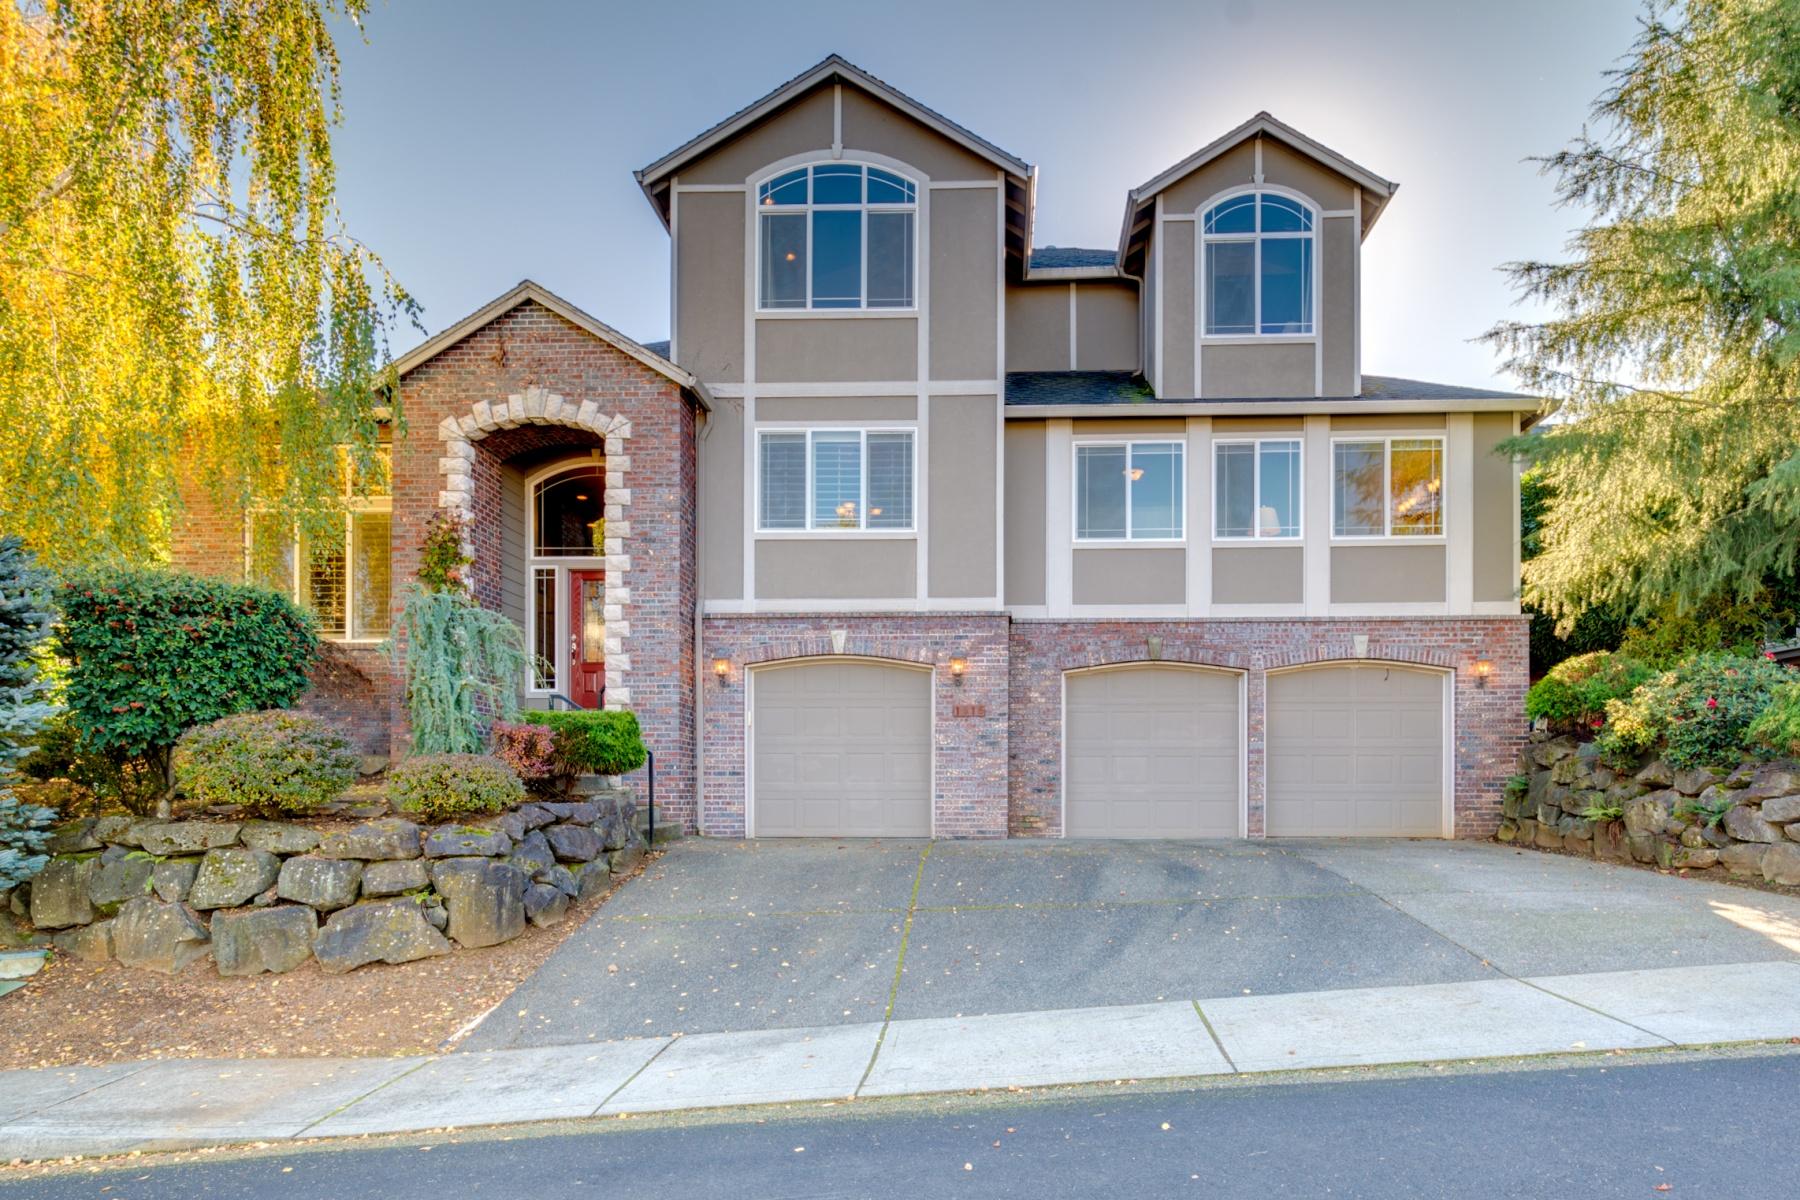 Casa Unifamiliar por un Venta en On the Hill in Camas 1616 NW 38TH Ave Camas, Washington 98607 Estados Unidos